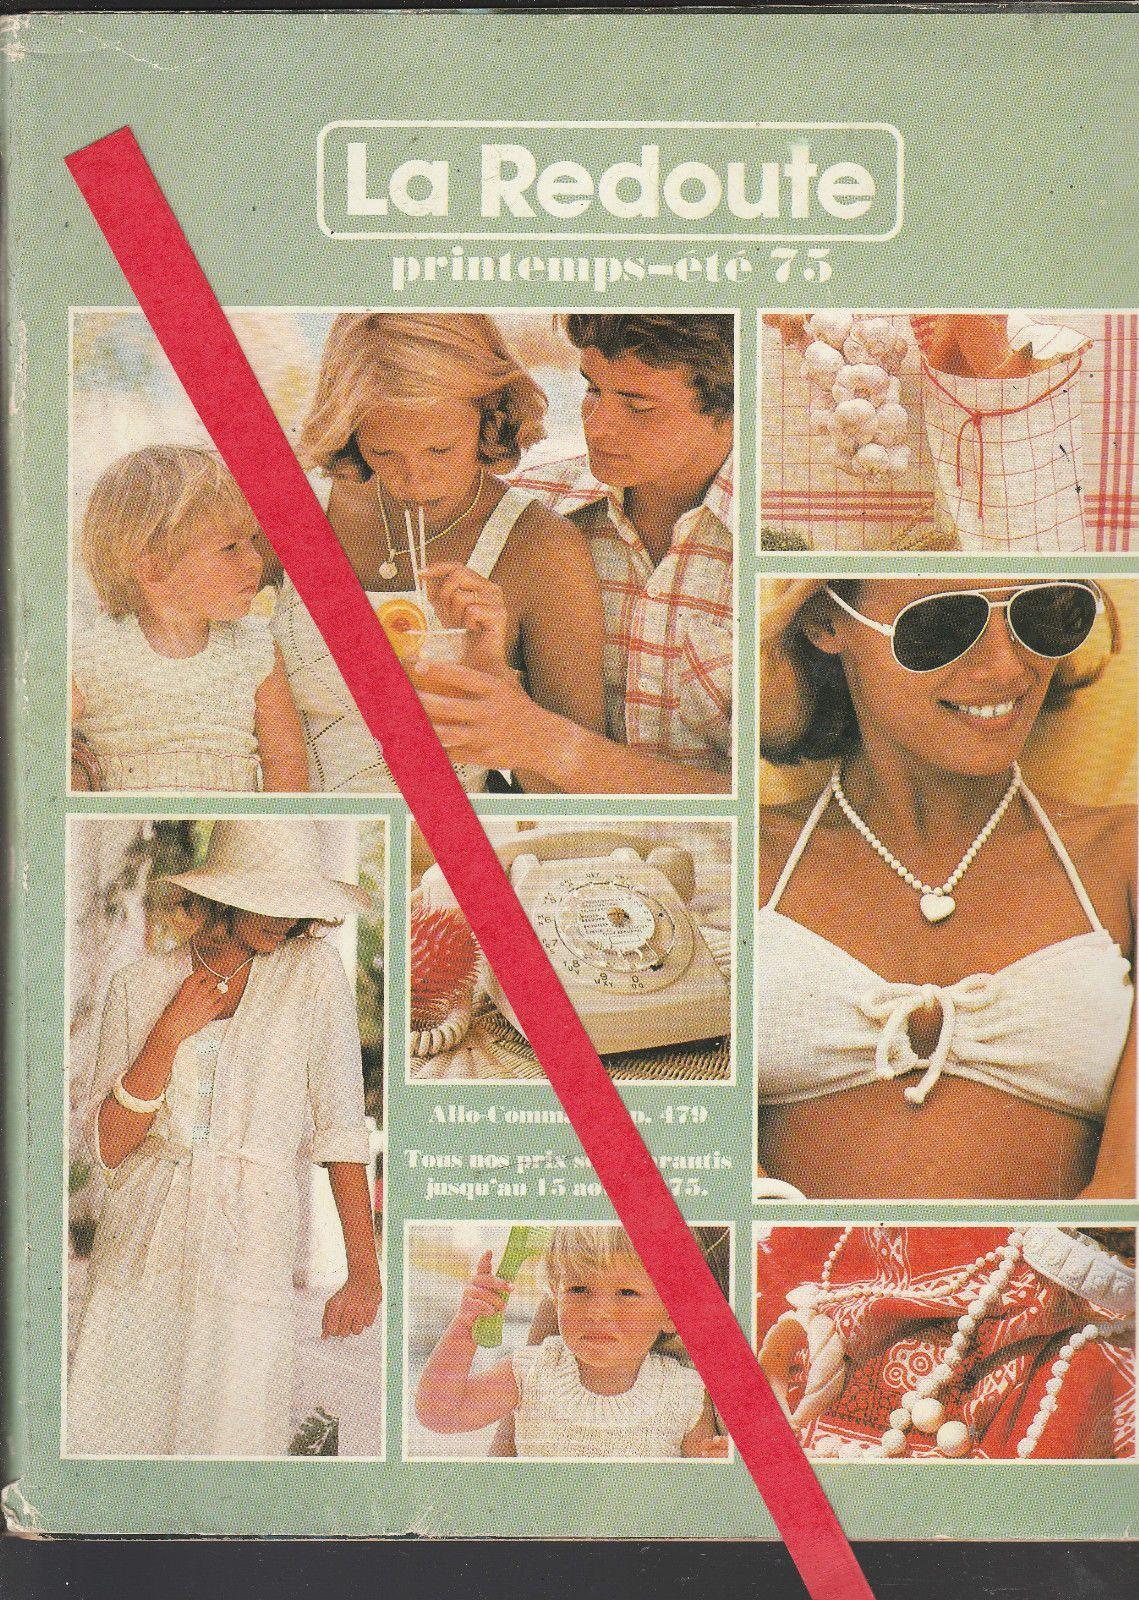 12831 1 catalogue la redoute printemps t 1975 766 pages ebay fashion clothing 1970. Black Bedroom Furniture Sets. Home Design Ideas